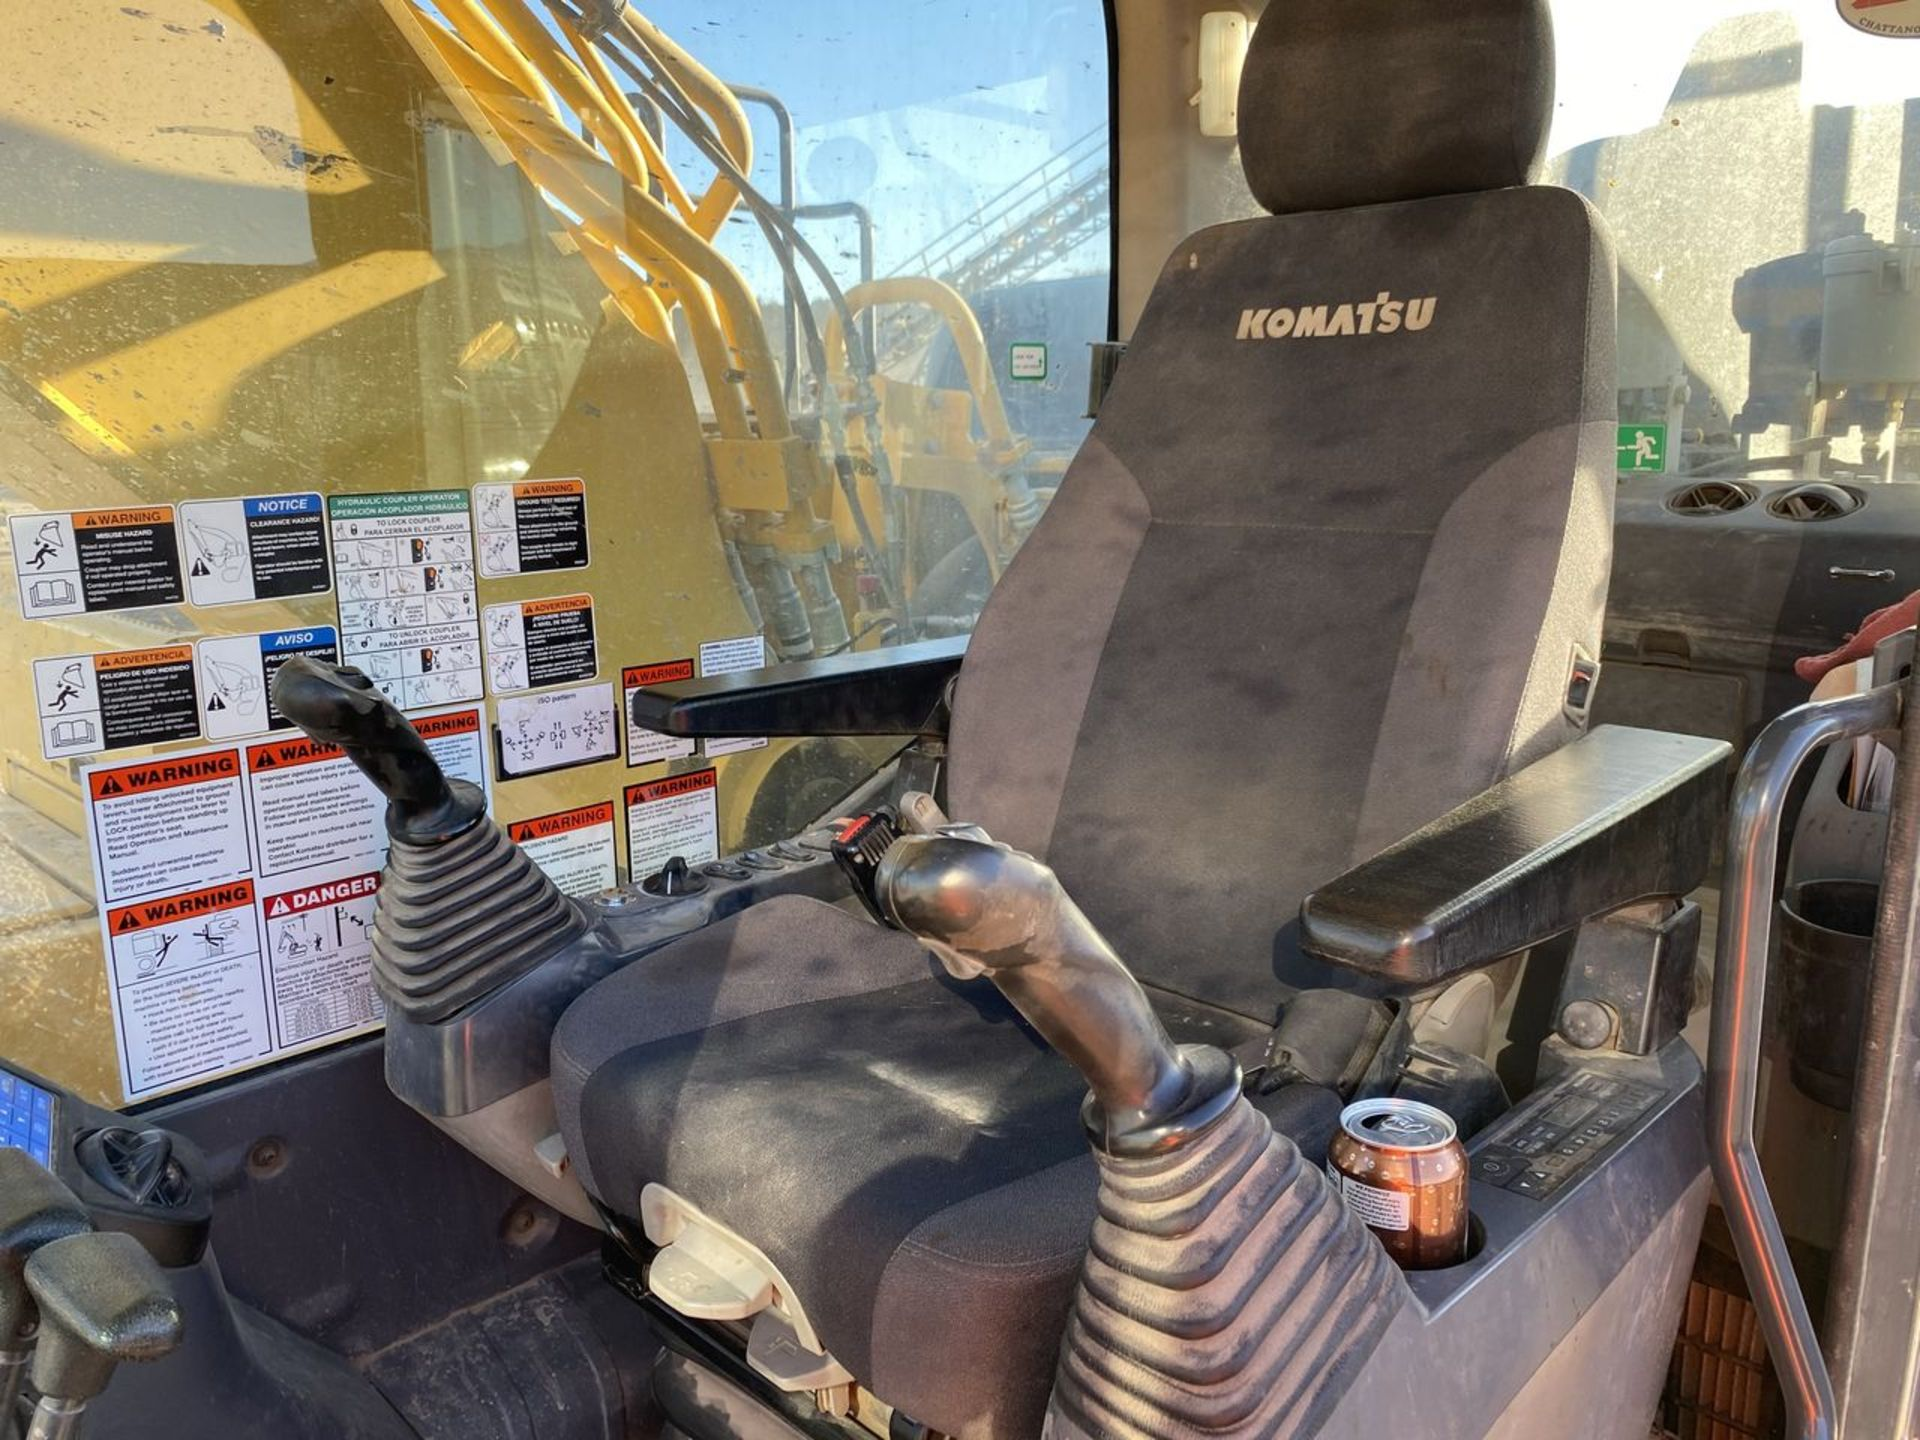 2018 Komatsu PC360LC-11 Hydraulic Crawler Excavator, S/N: A36863, PIN: KMTPC256CJWA36863; with 2,883 - Image 7 of 19